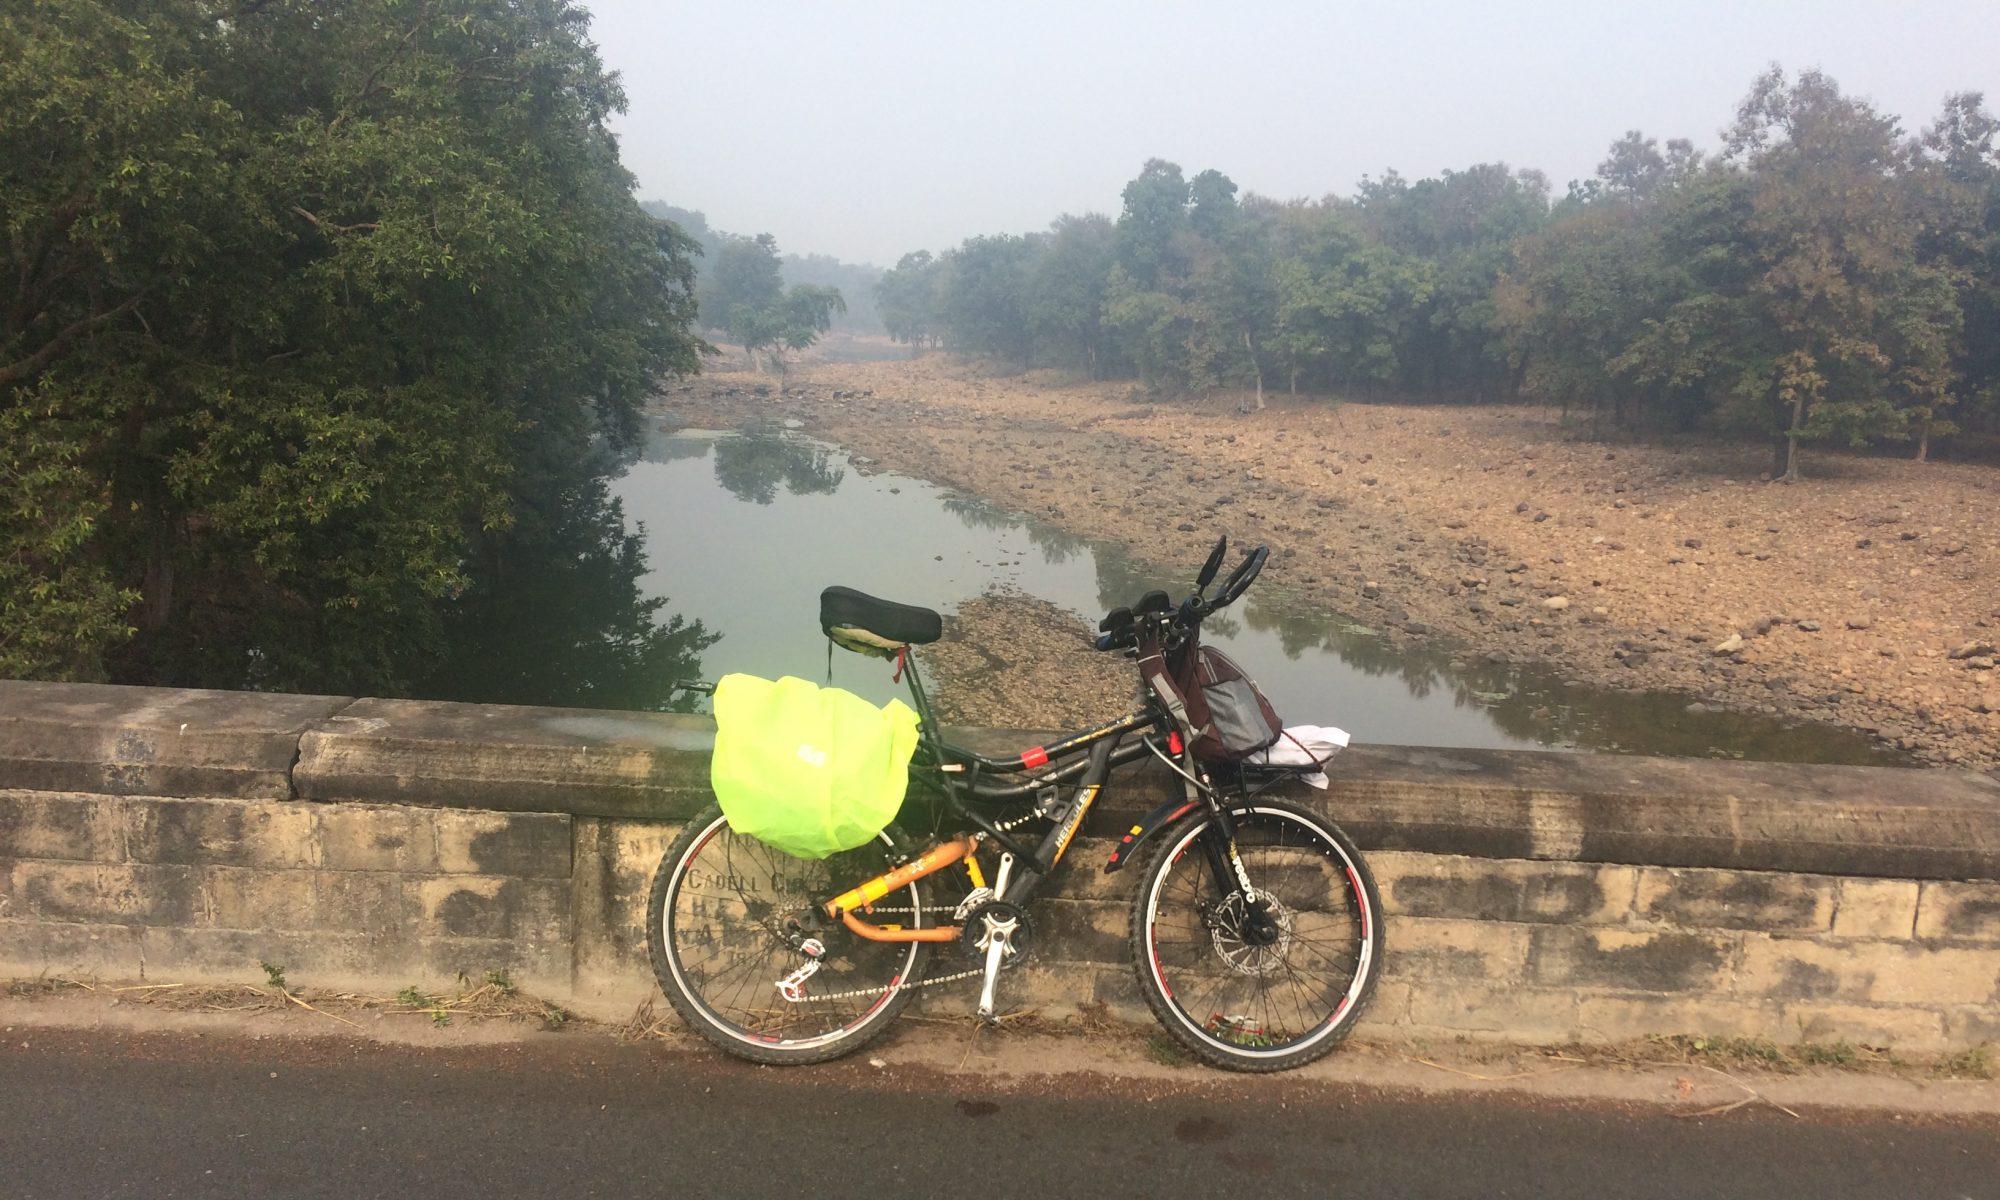 Rabid Cyclist